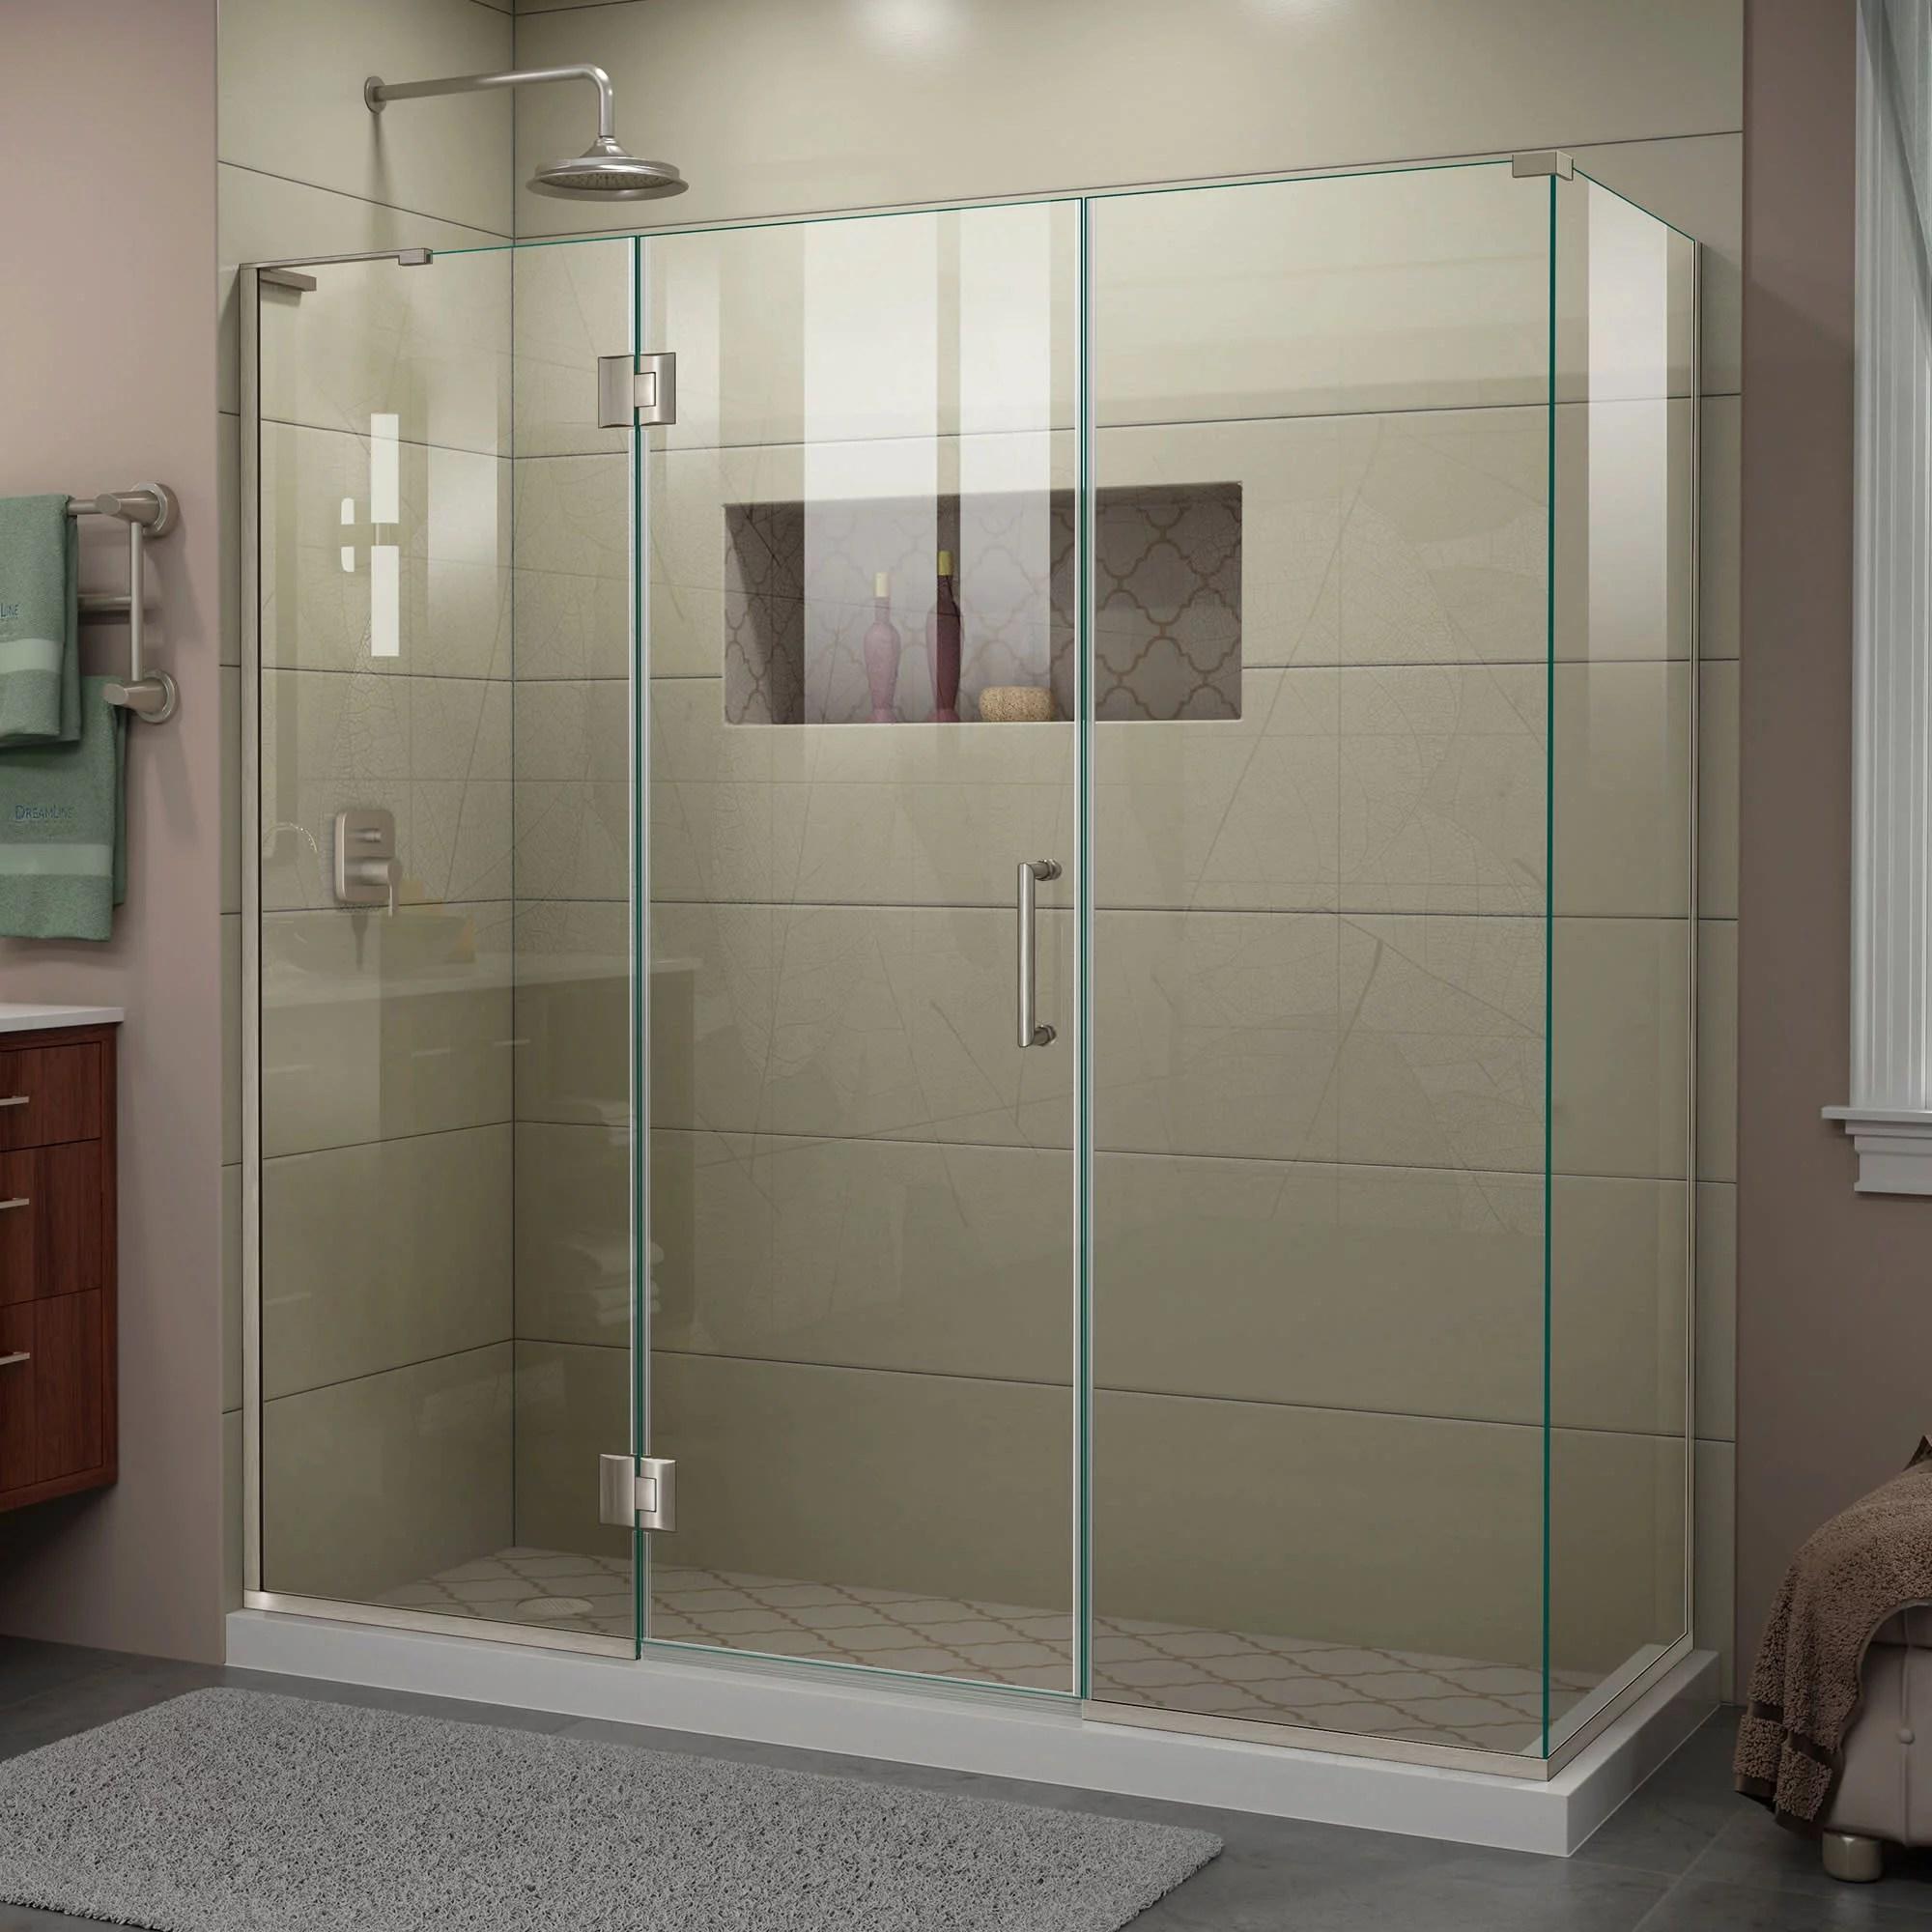 Dreamline Unidoor X 70 In W X 34 3 8 In D X 72 In H Frameless Hinged Shower Enclosure In Brushed Nickel